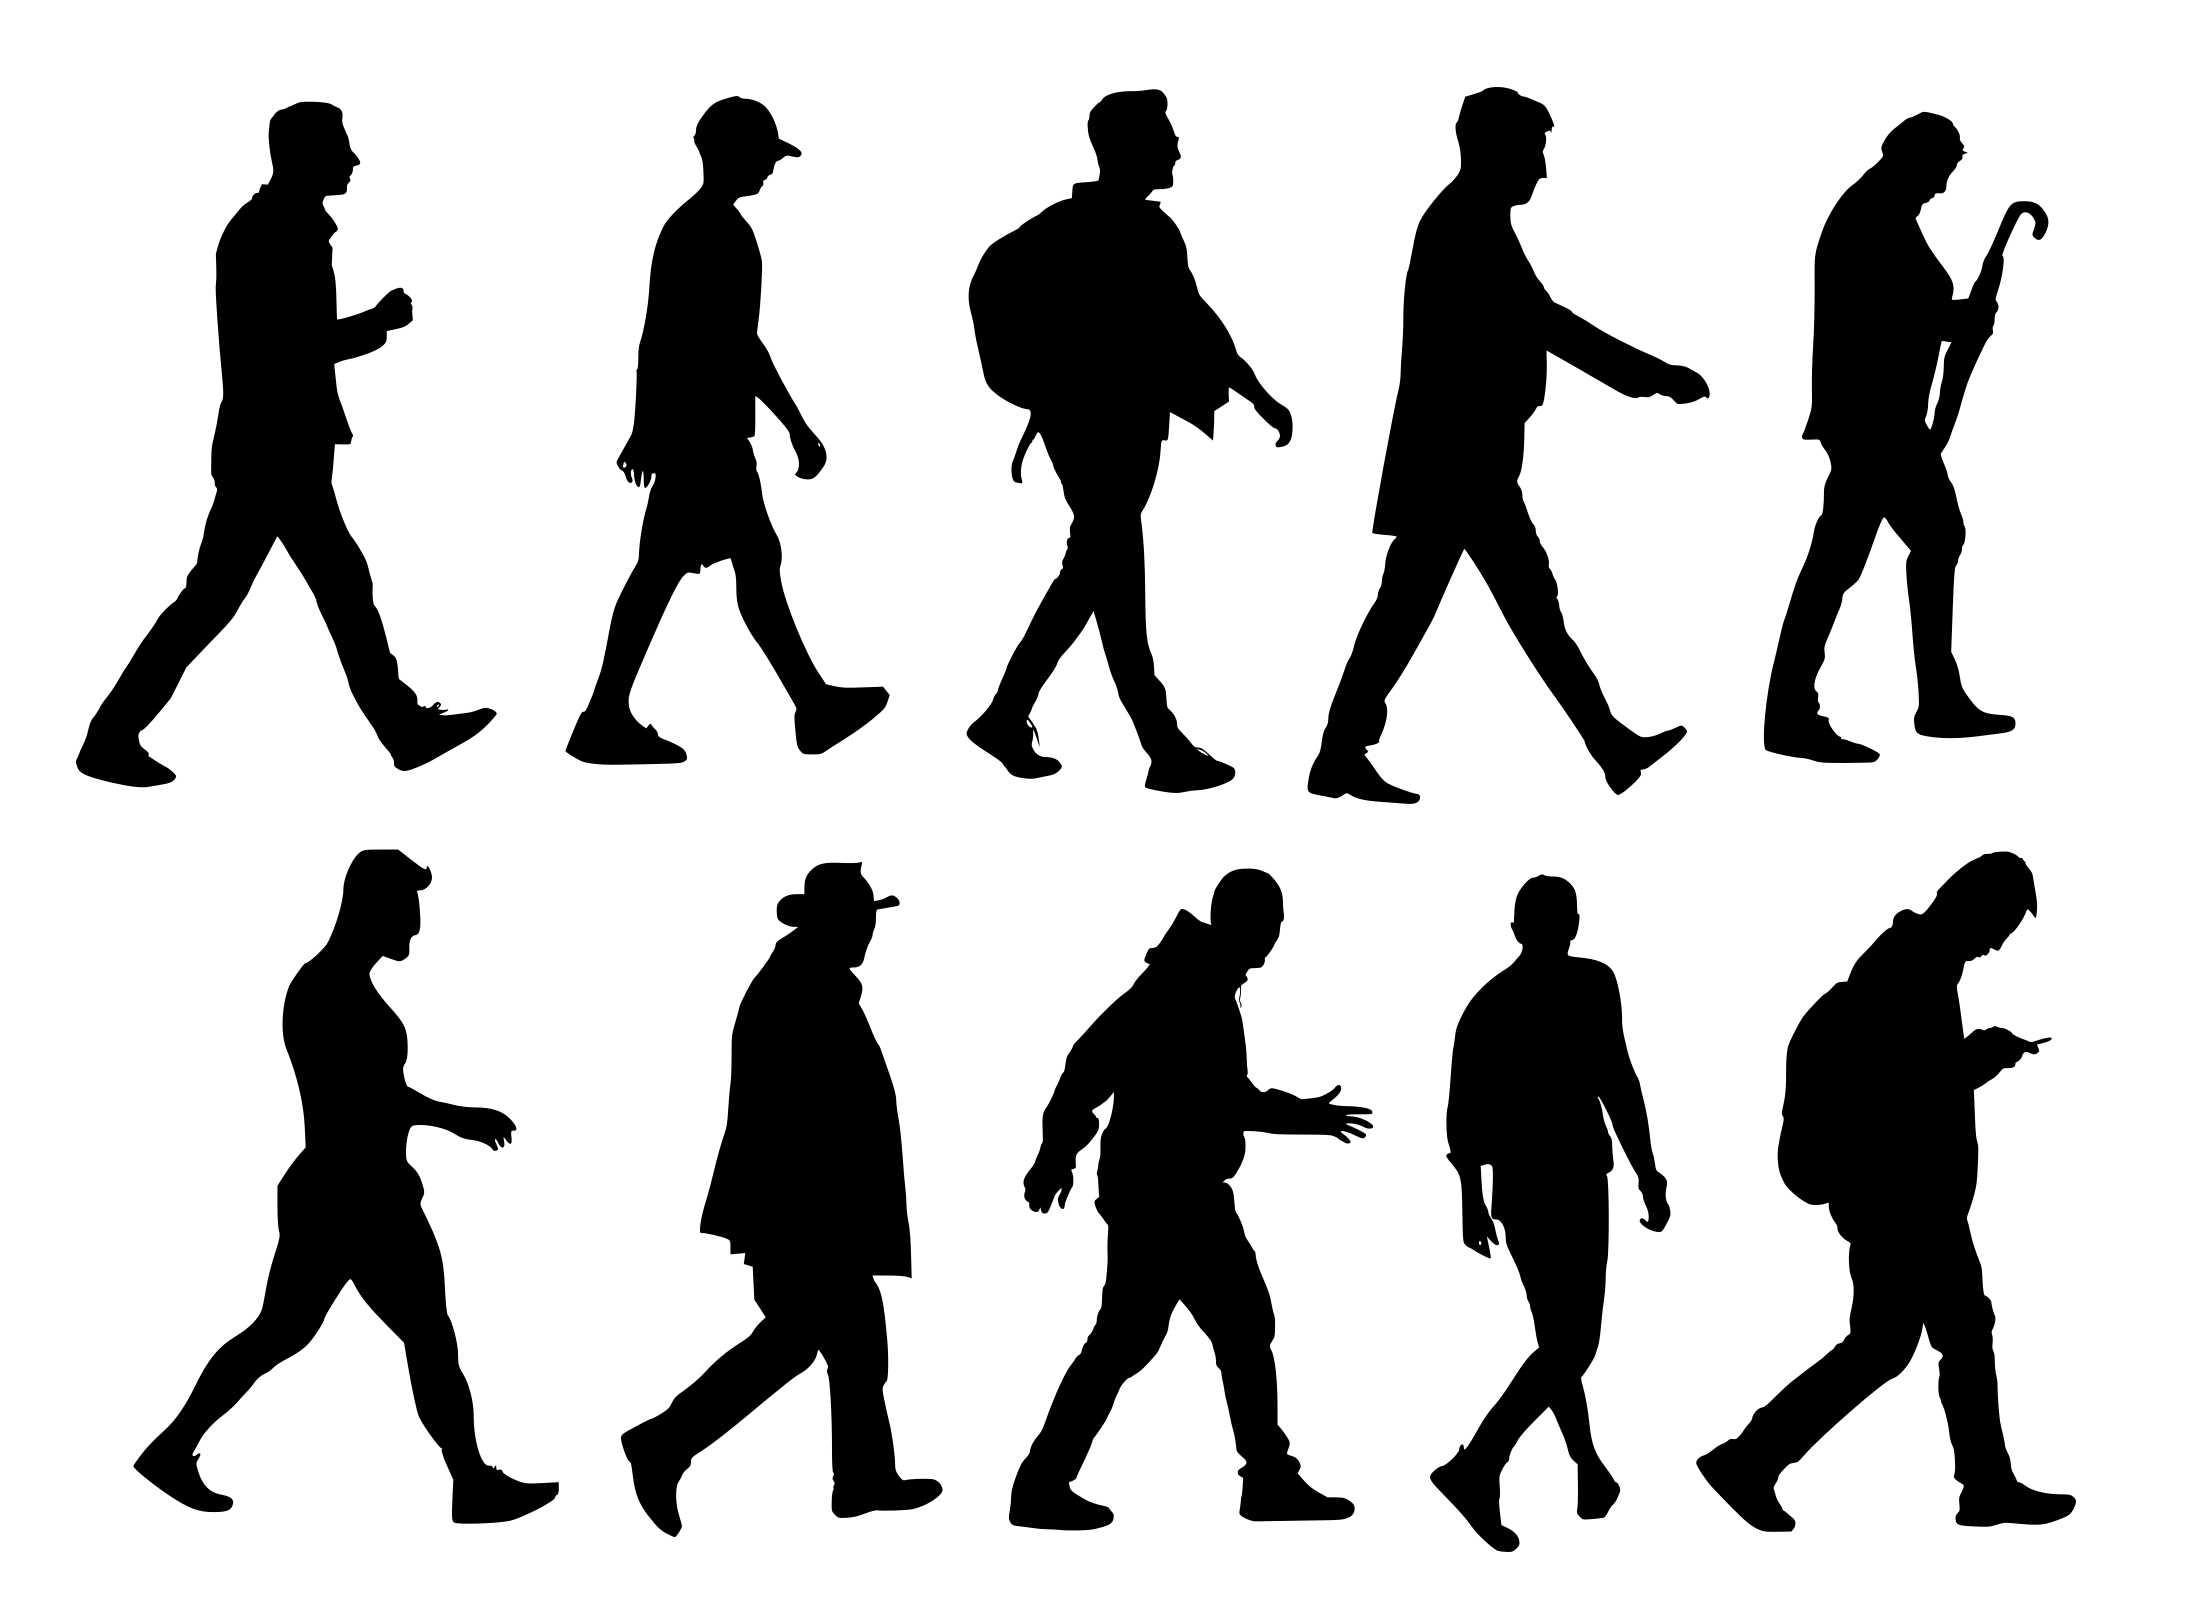 10-man-walking-silhouette-cover.jpg